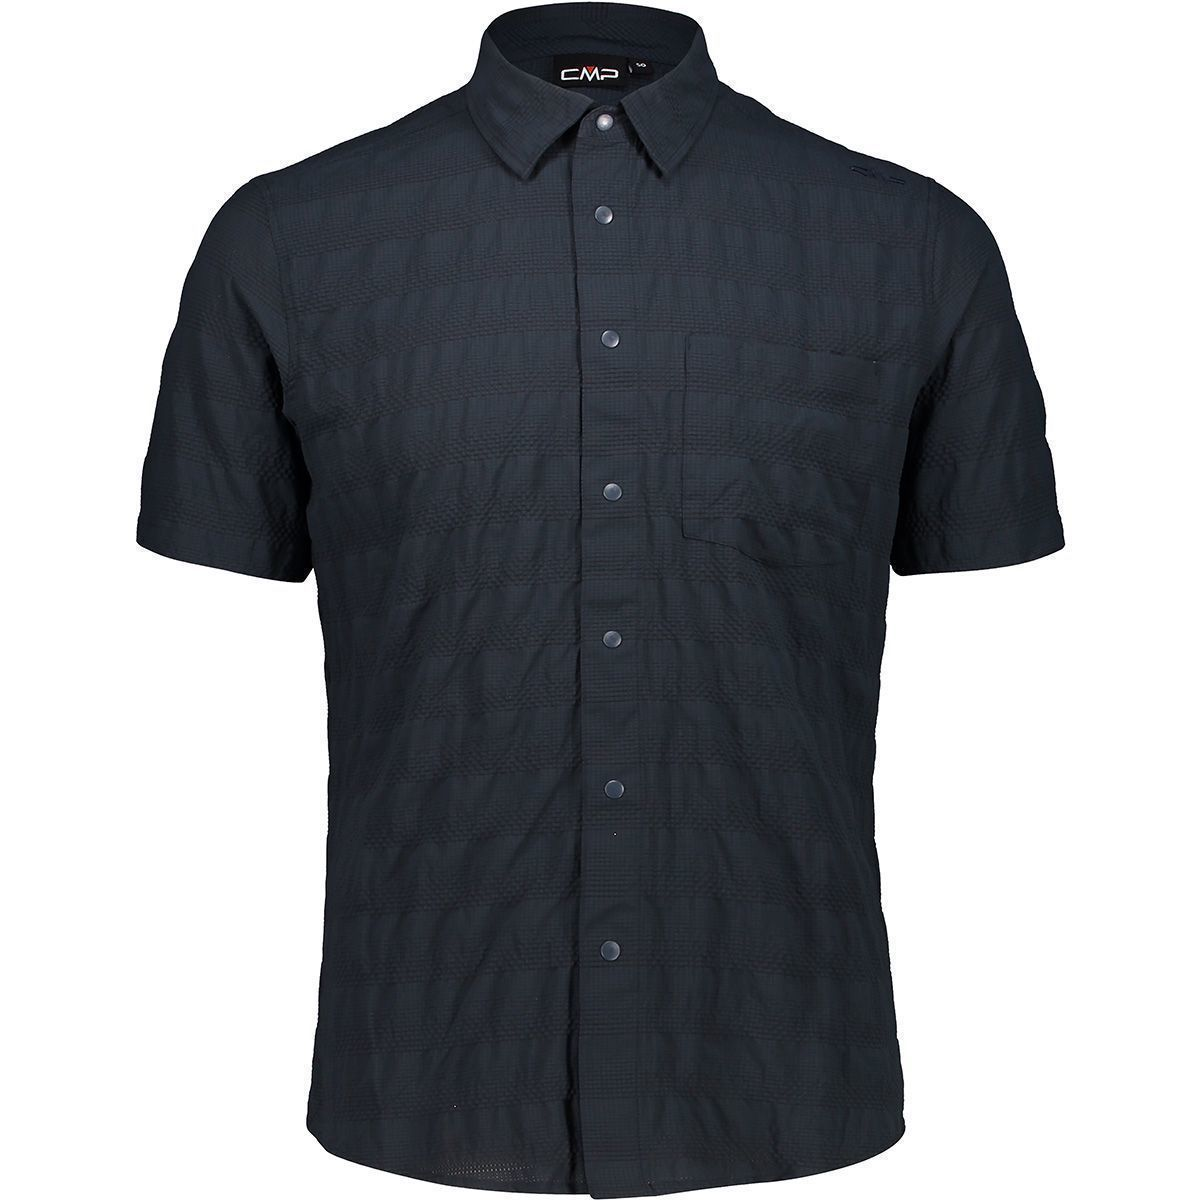 Dry Shirt Check